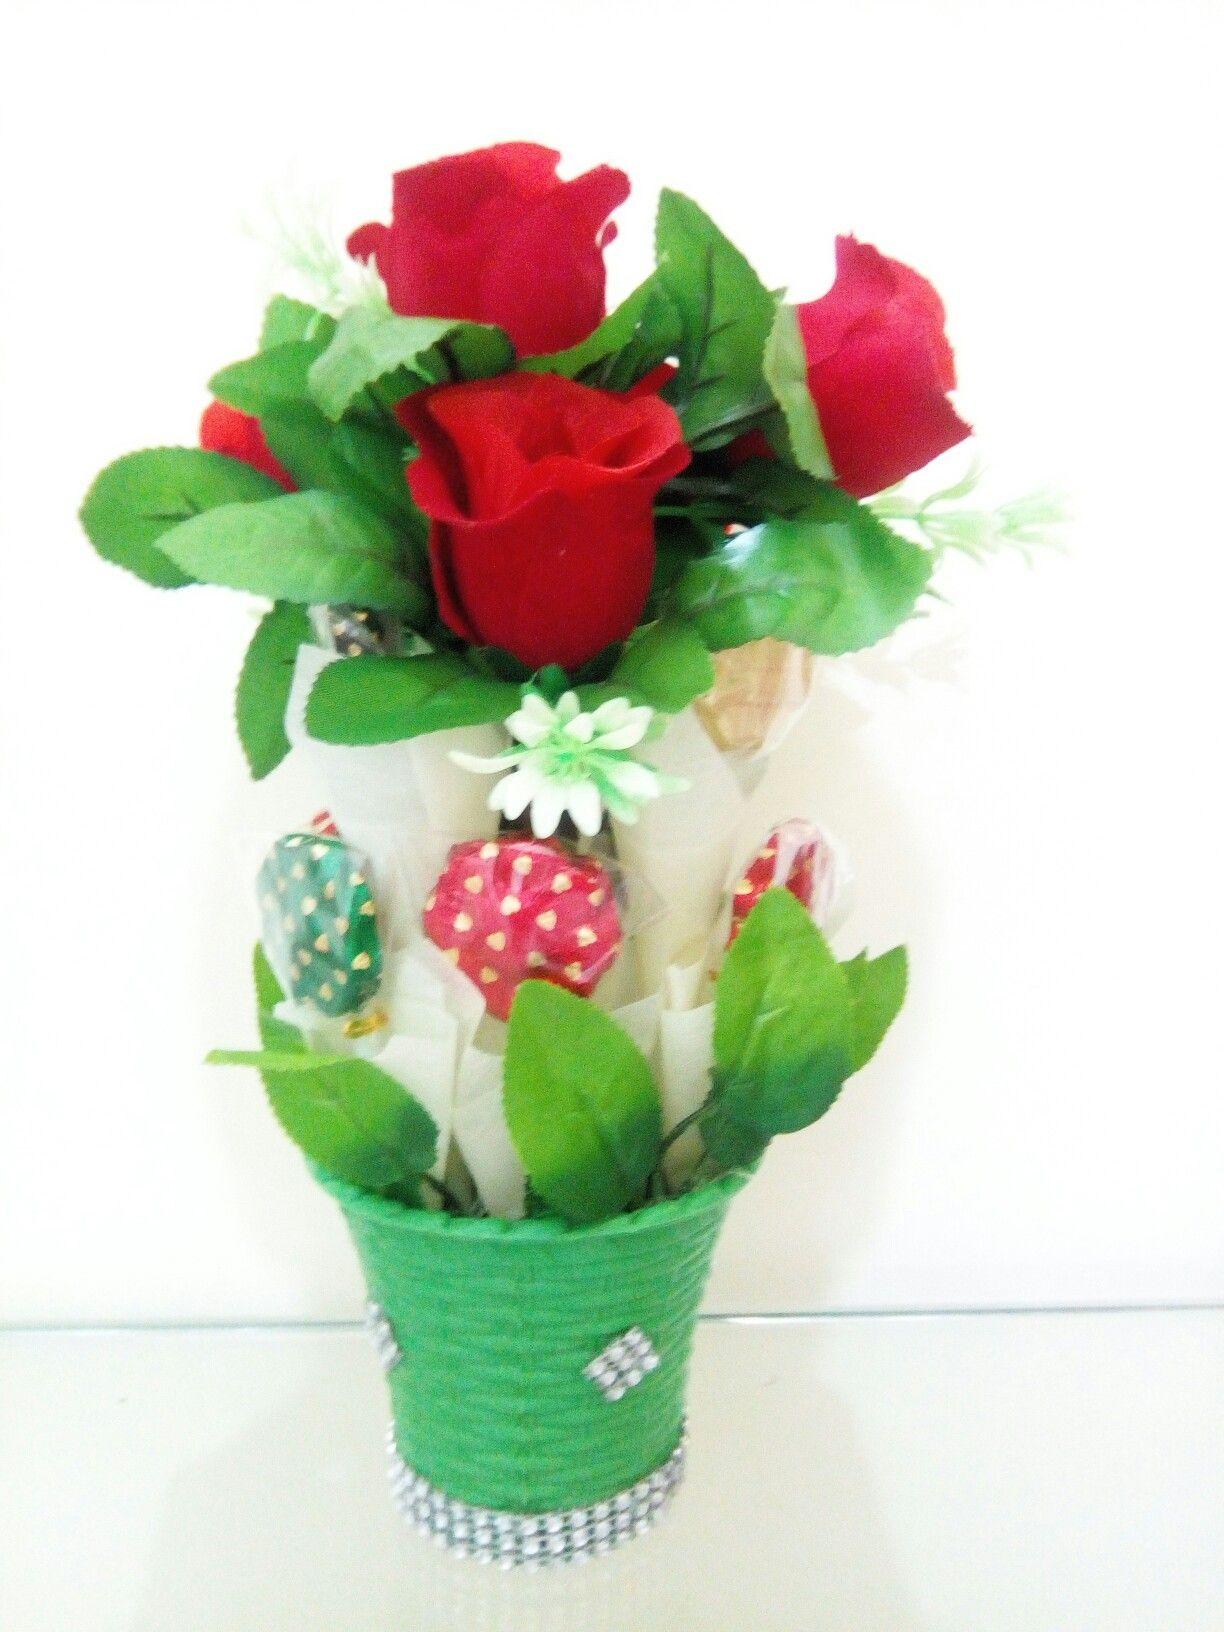 Flower vase with chocolates a unique conceptual chocolate bouquet flower vase with chocolates a unique conceptual chocolate bouquet izmirmasajfo